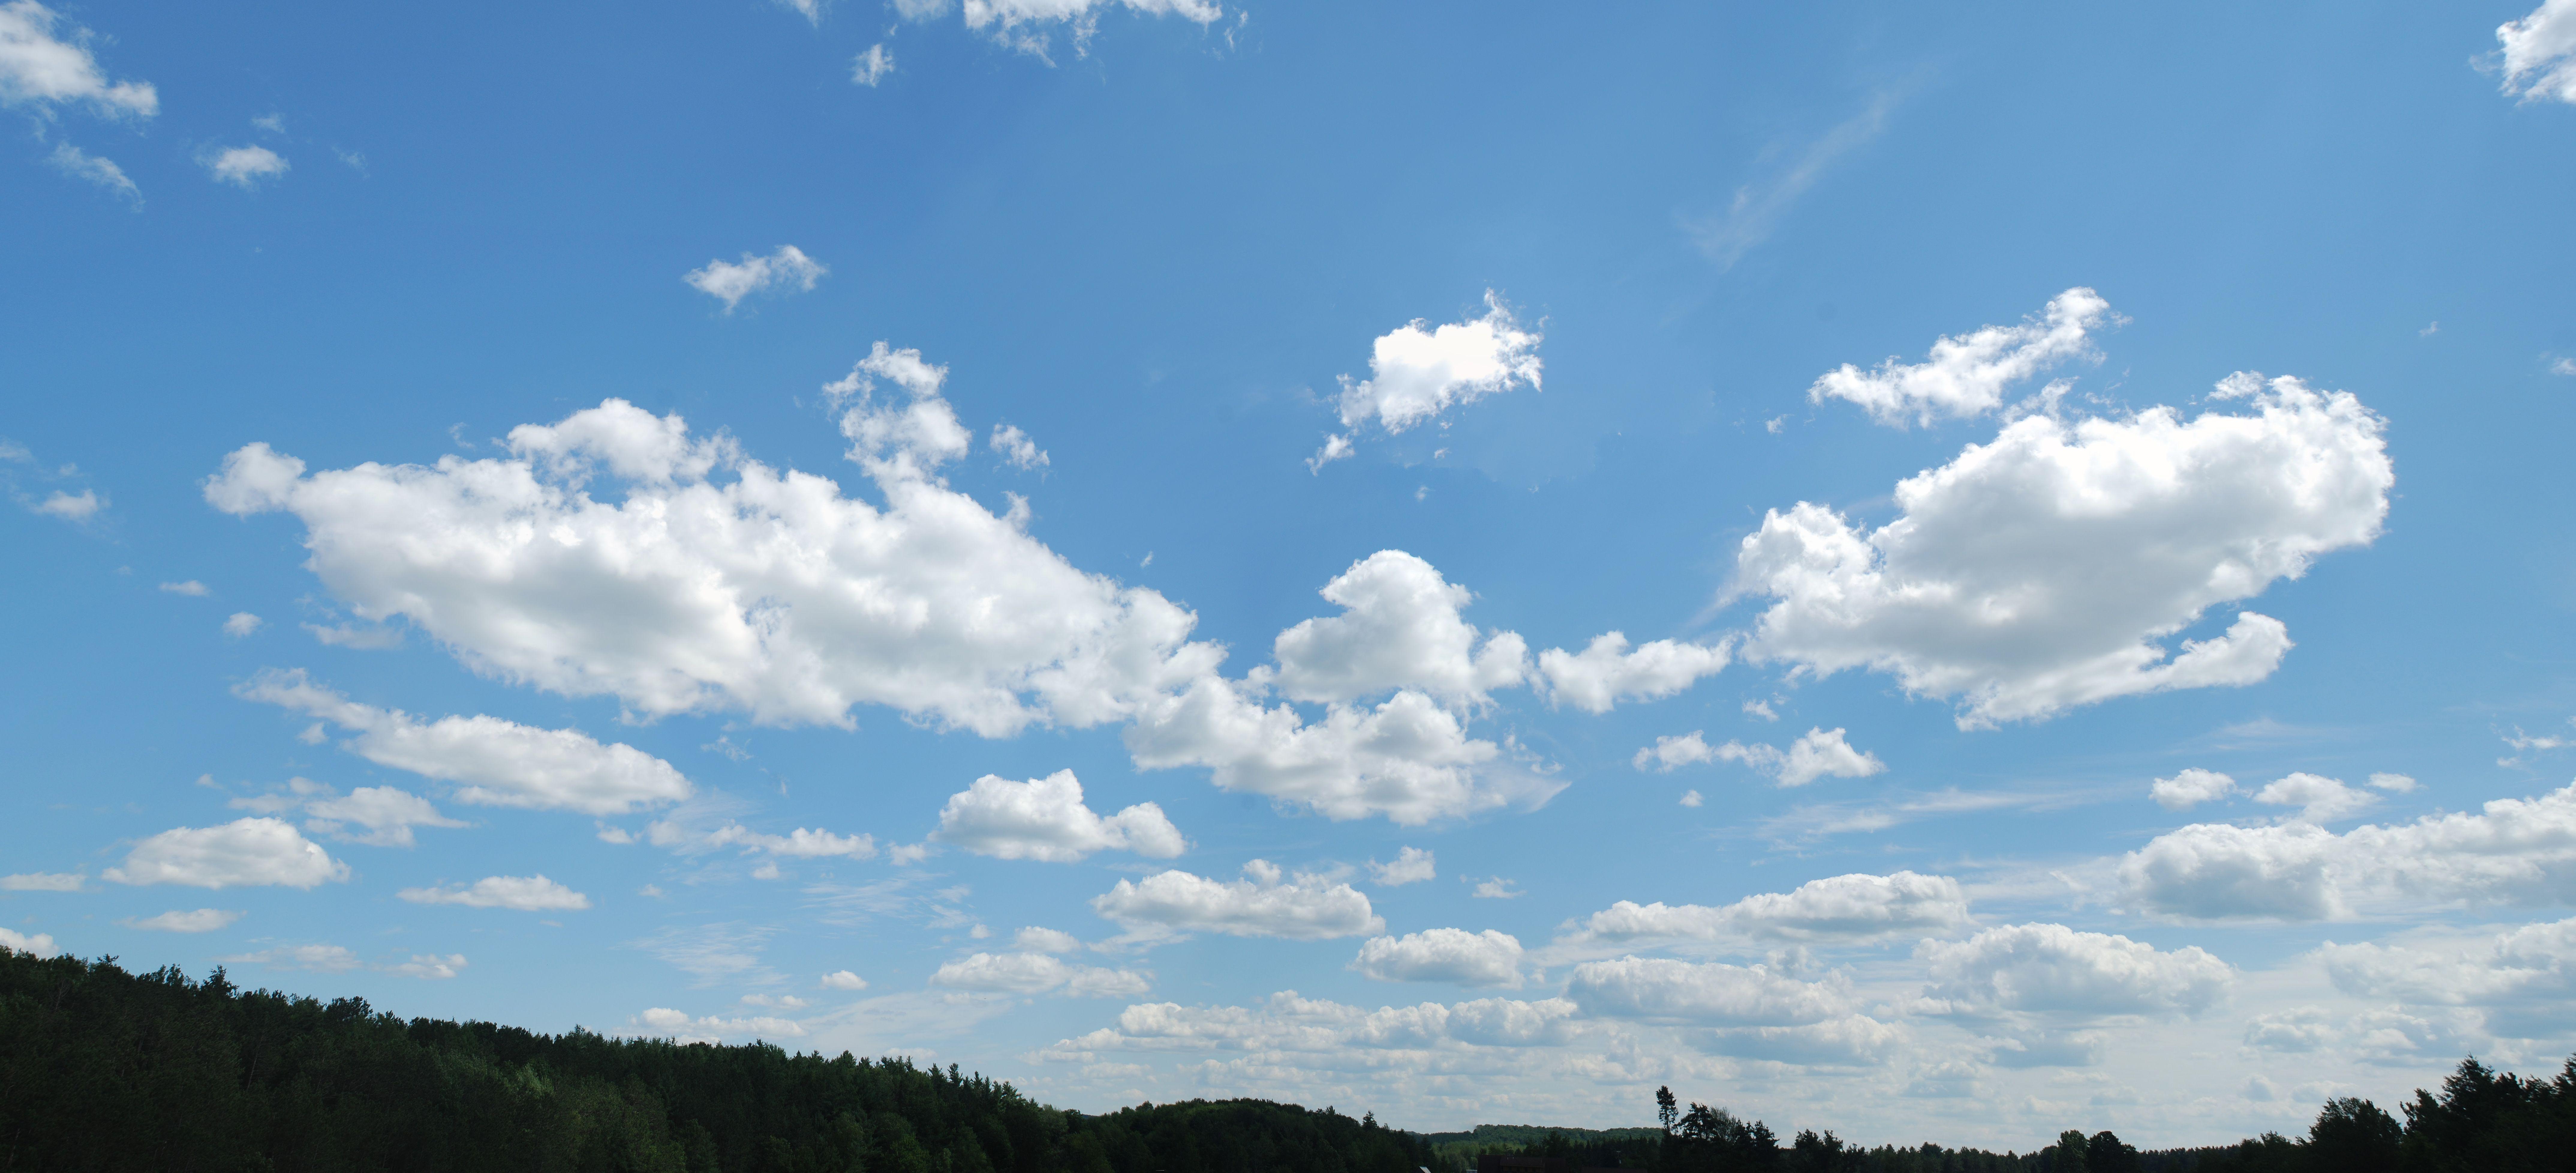 Blue sky/few clouds   Clouds   Pinterest